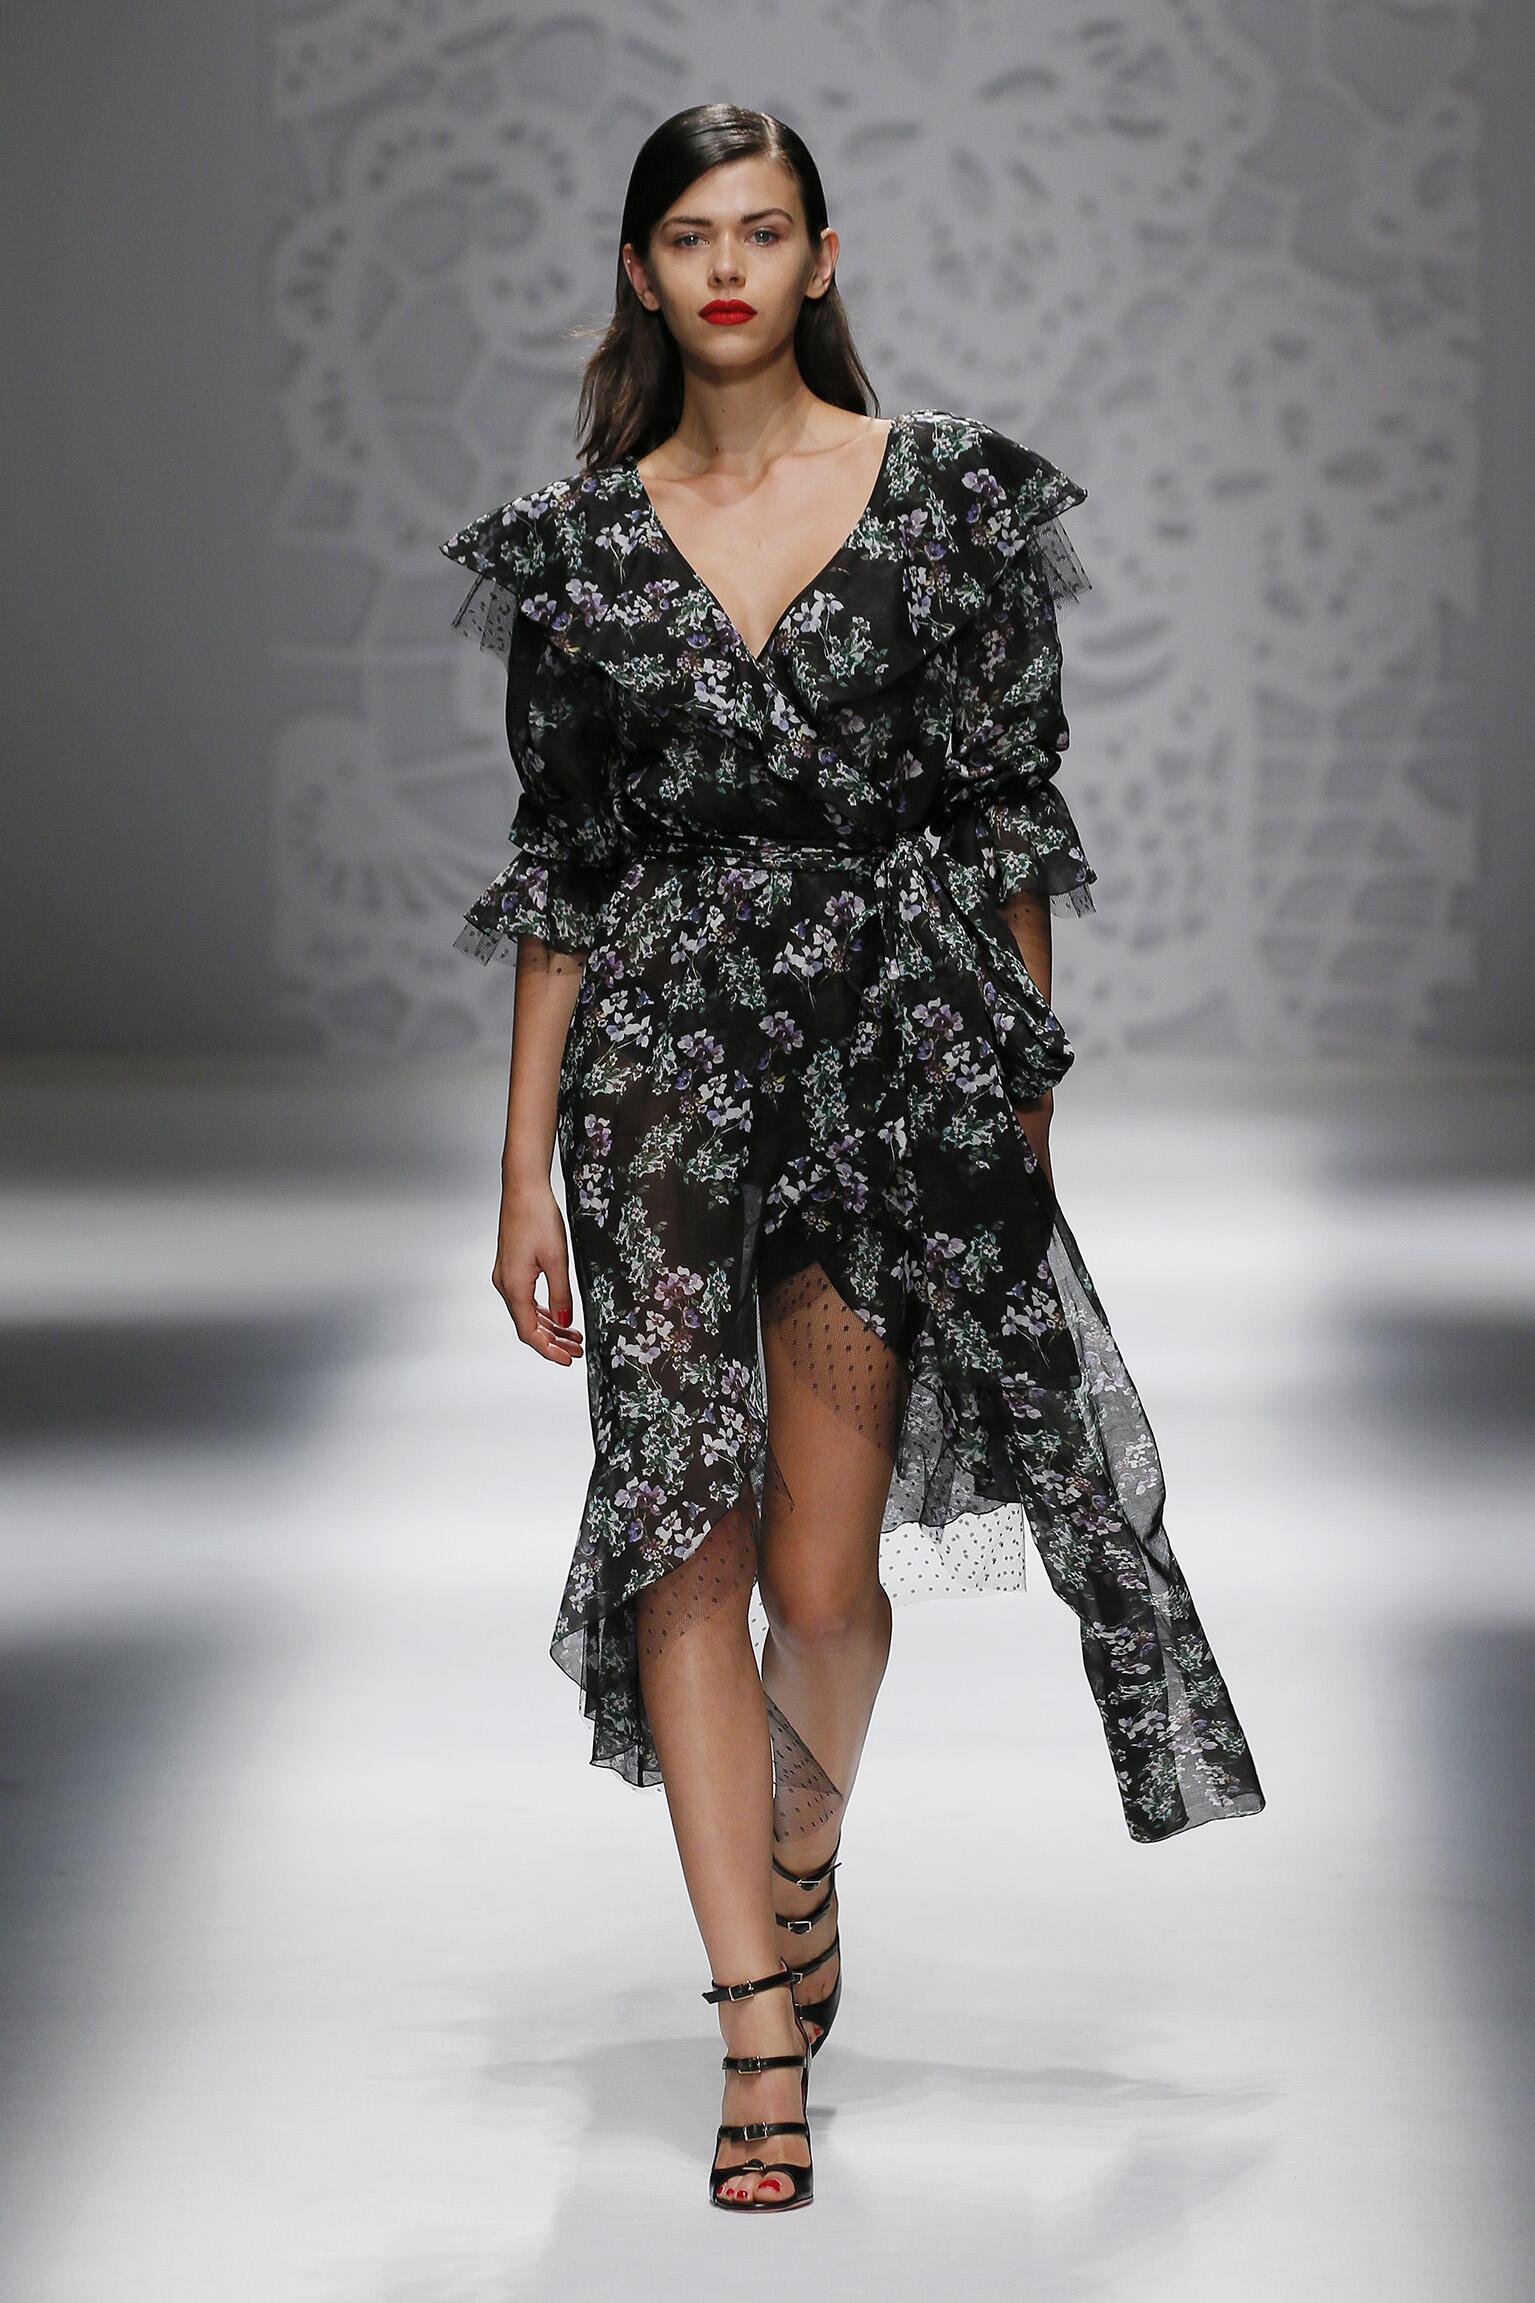 Fashion Model Blumarine Catwalk